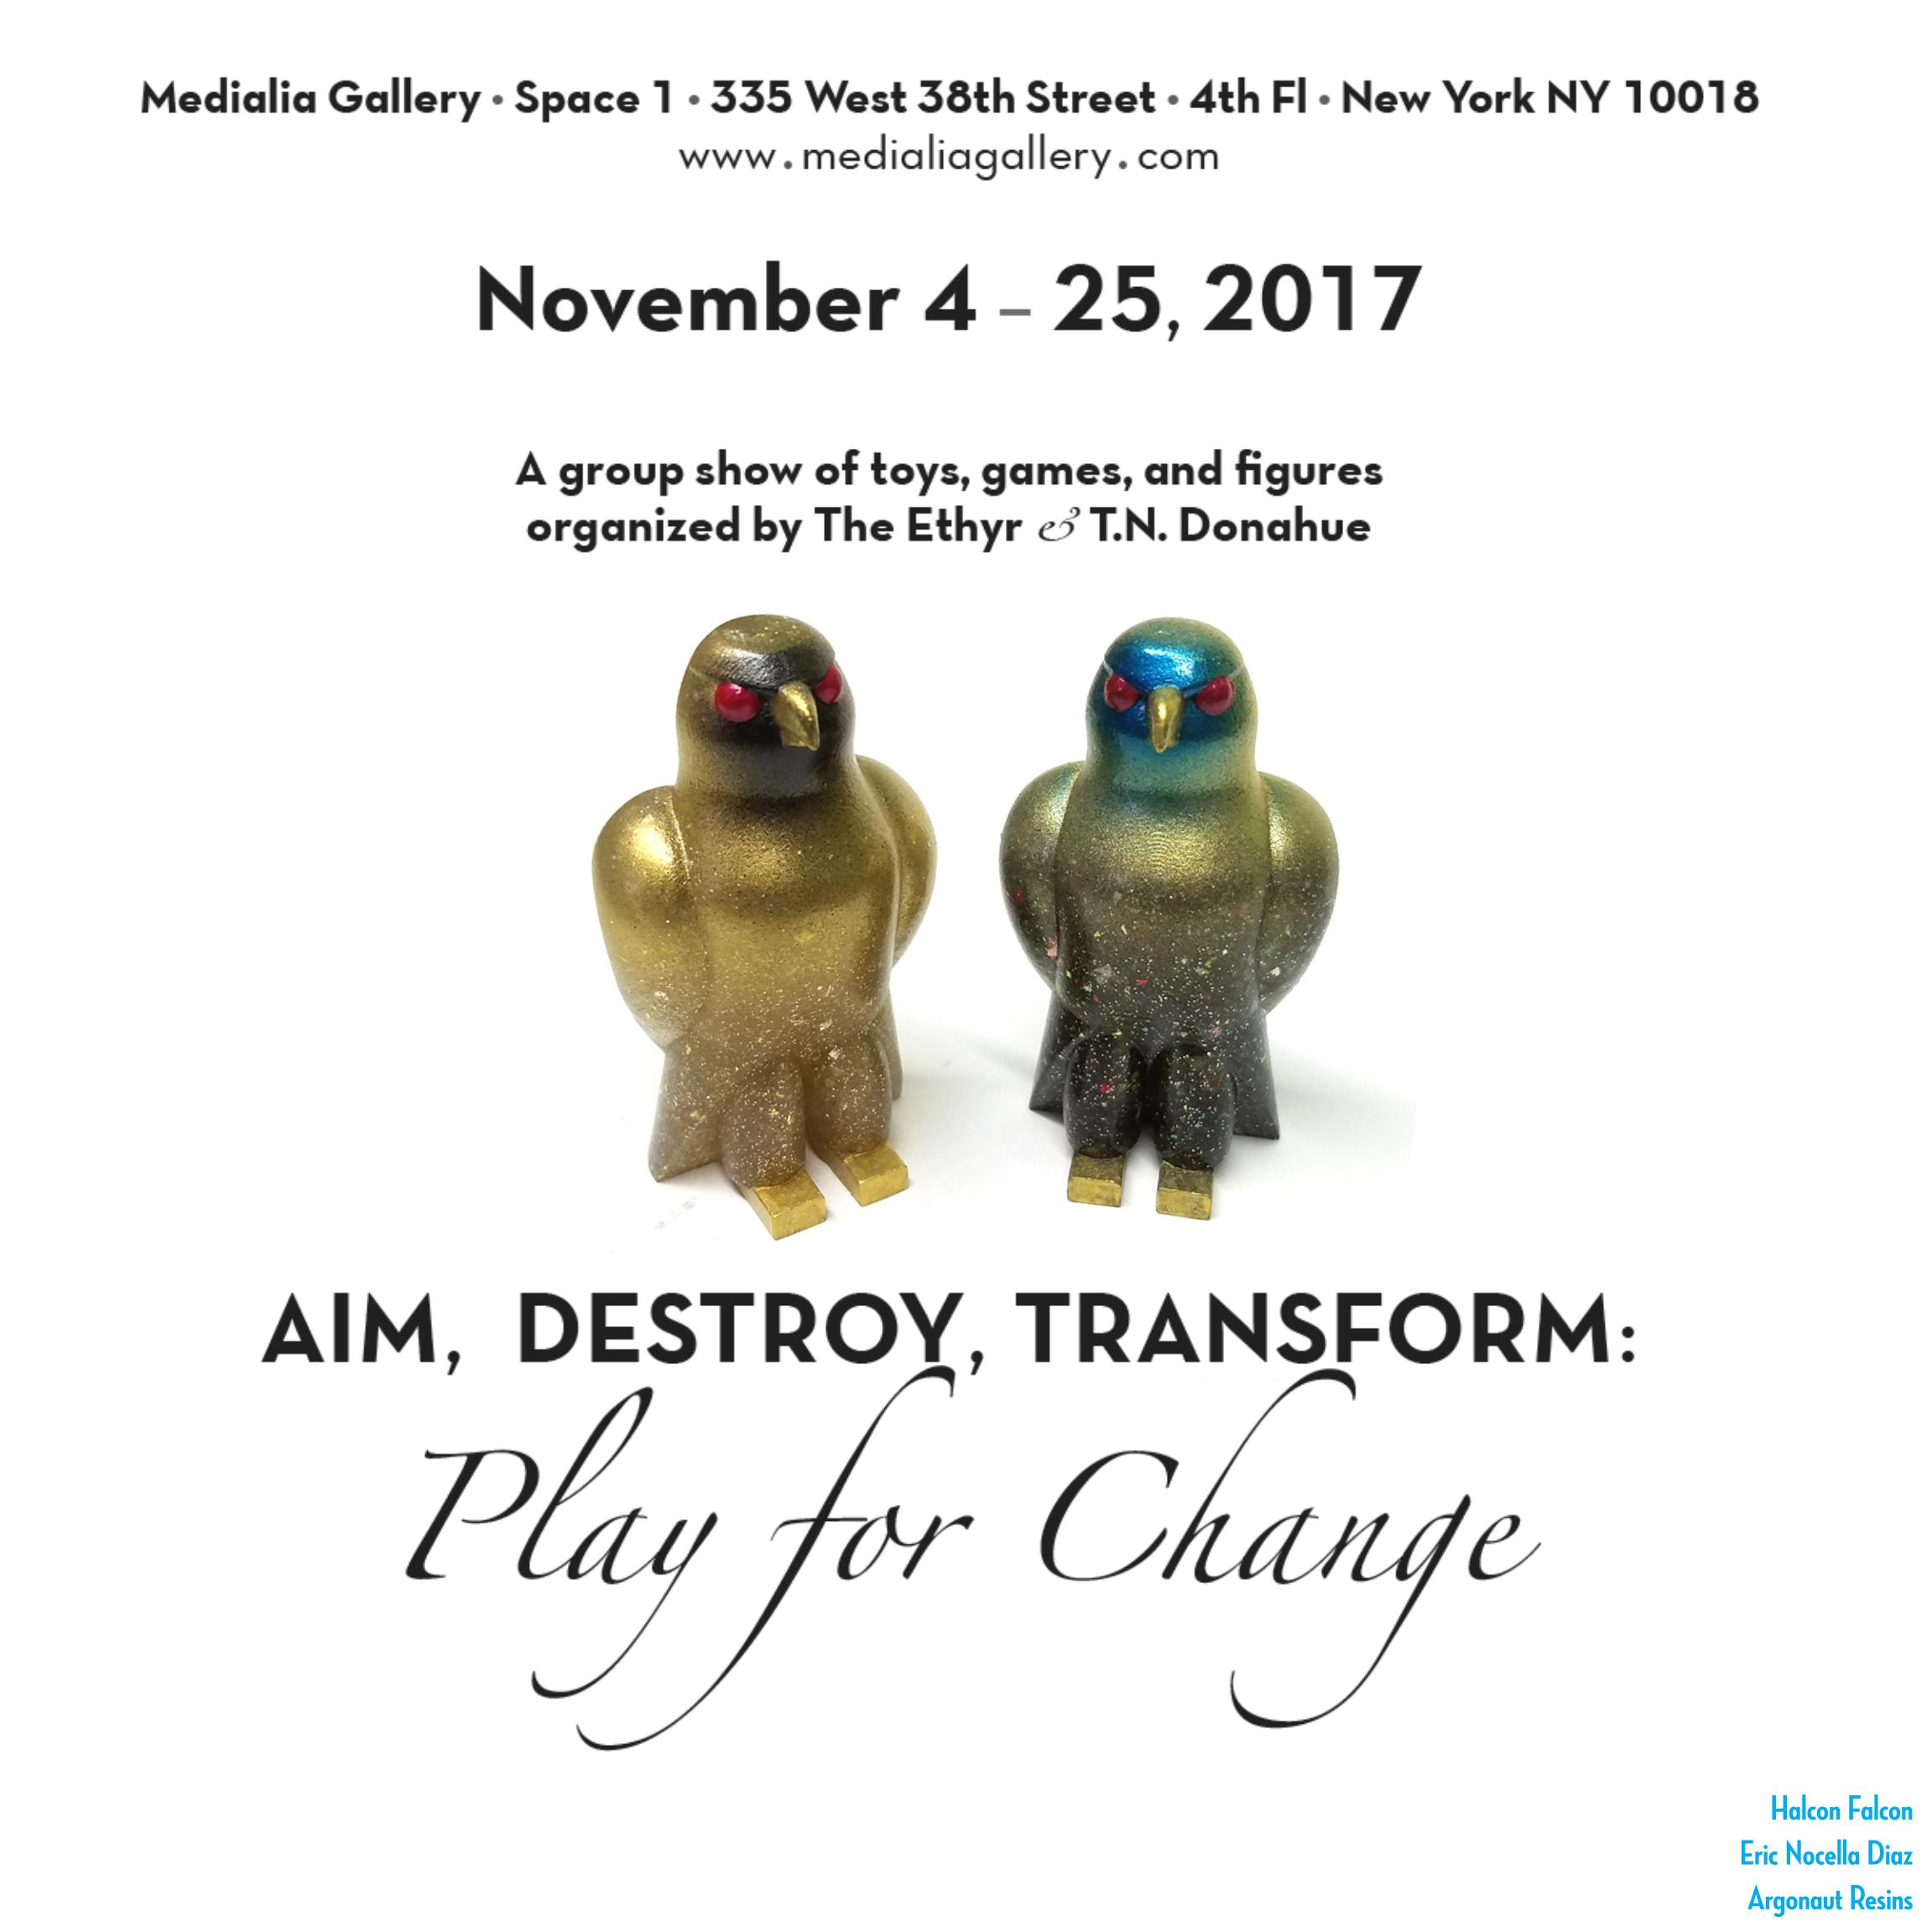 MedialiaGallery_The_Ethyr_AimDestroyTransform_Toy_Show_announcement_Halcon_Falcon_Eric_Nocella_Diaz_Argonaut_Resins_November_2017.jpg.png